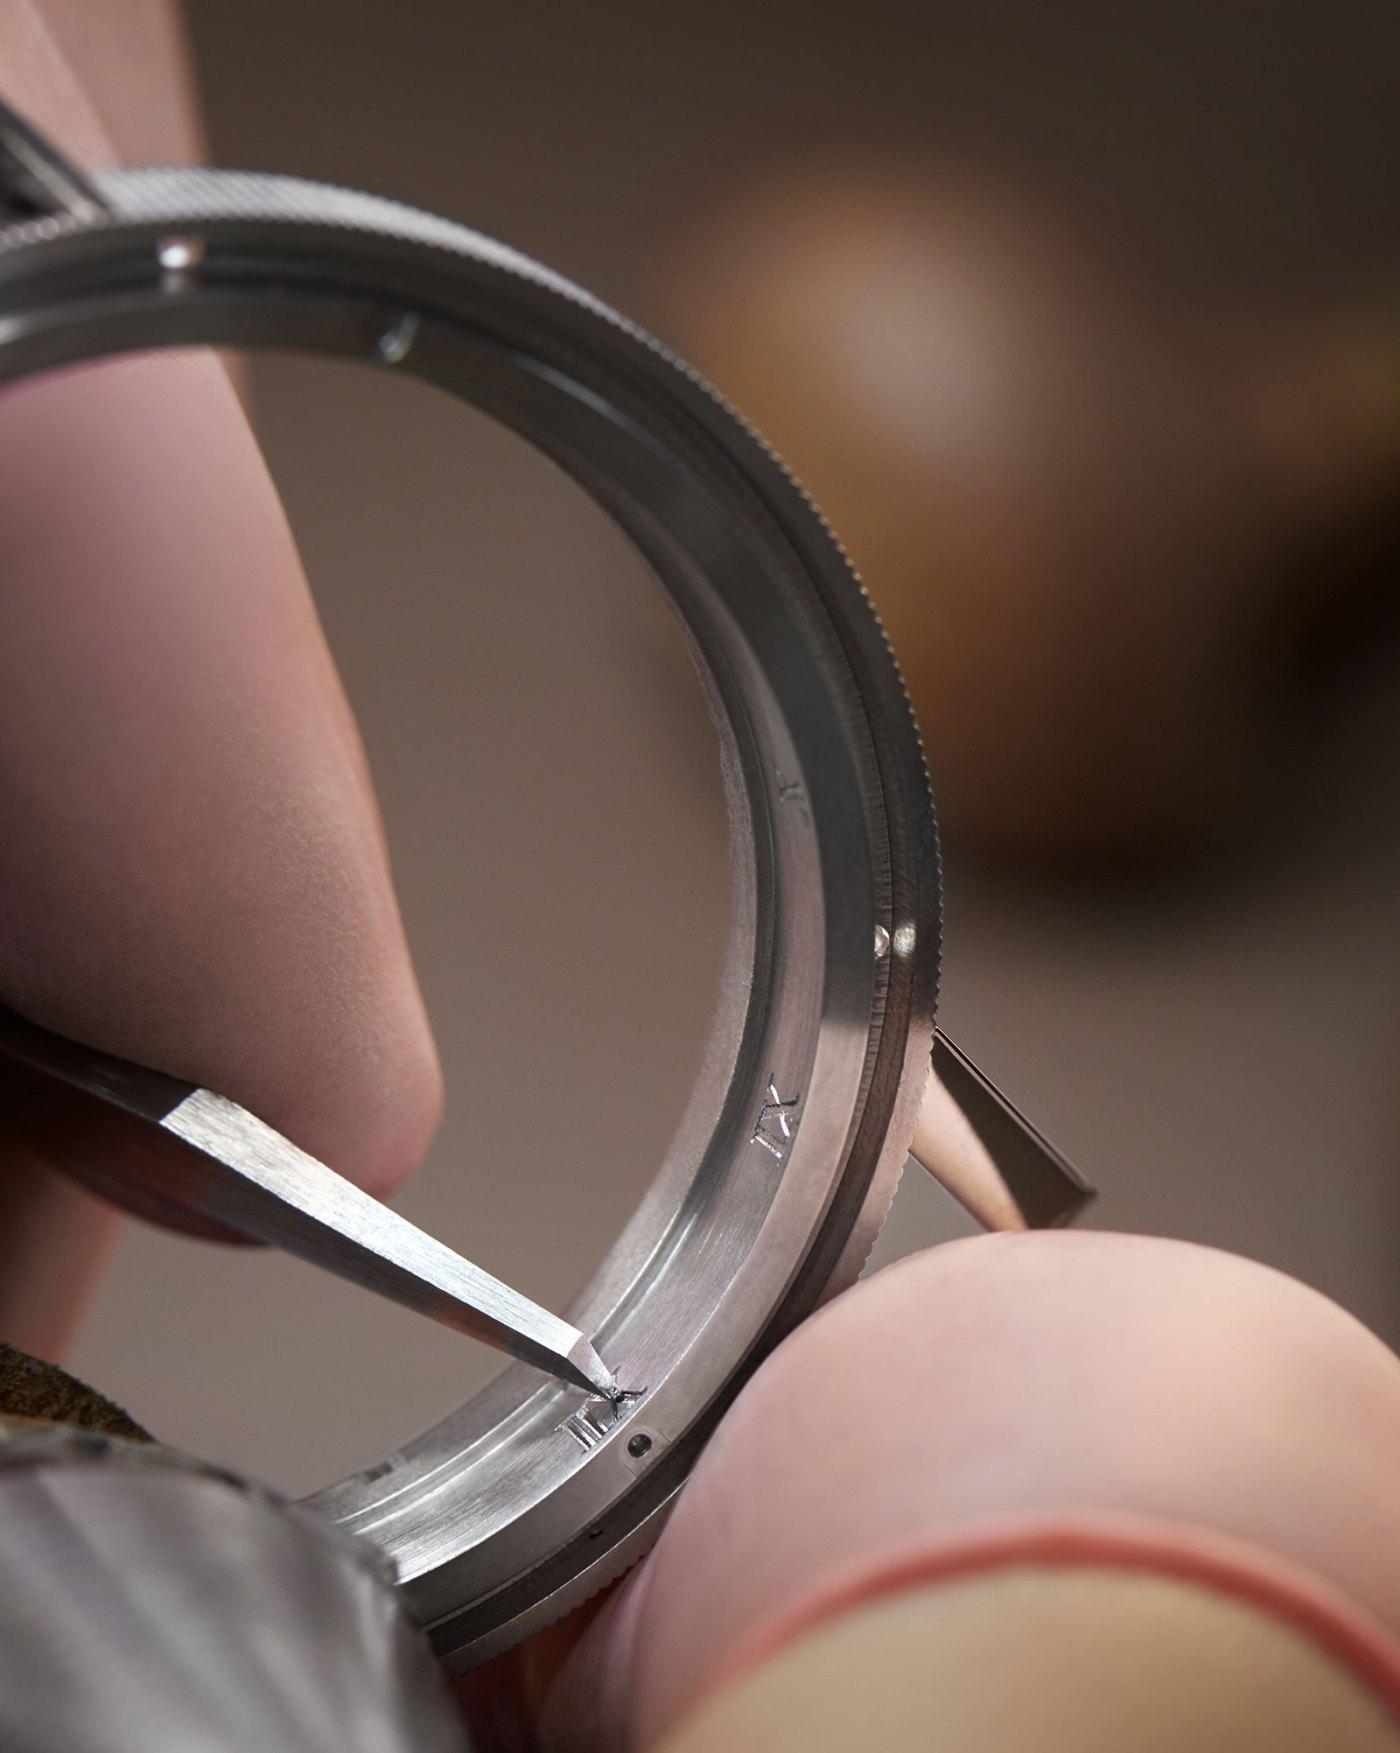 Breguet Classique Double Tourbillon 5345 Quai de l'Horloge engraving